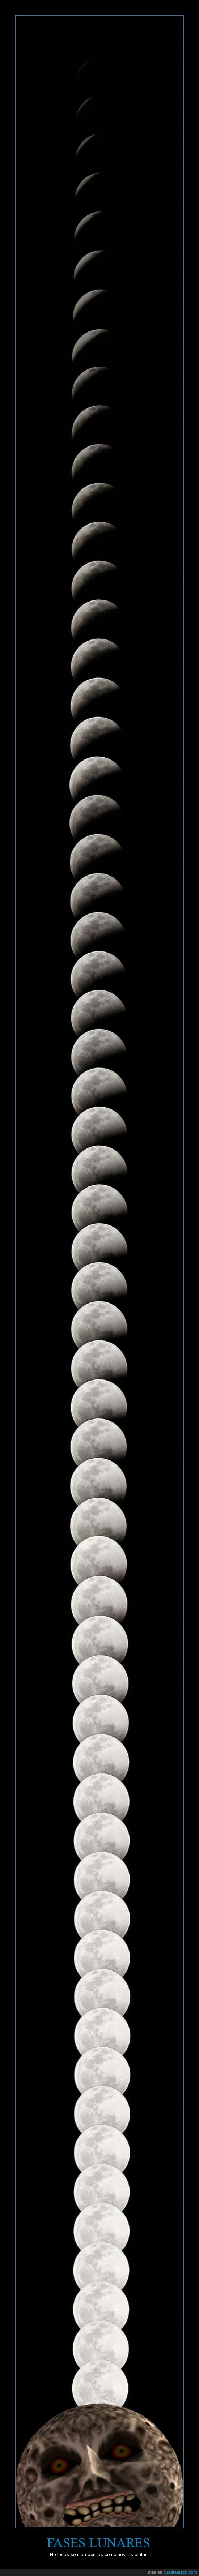 3 dias,fases lunares,foto de infarto,Luna,Majora's Mask,The Legend of Zelda